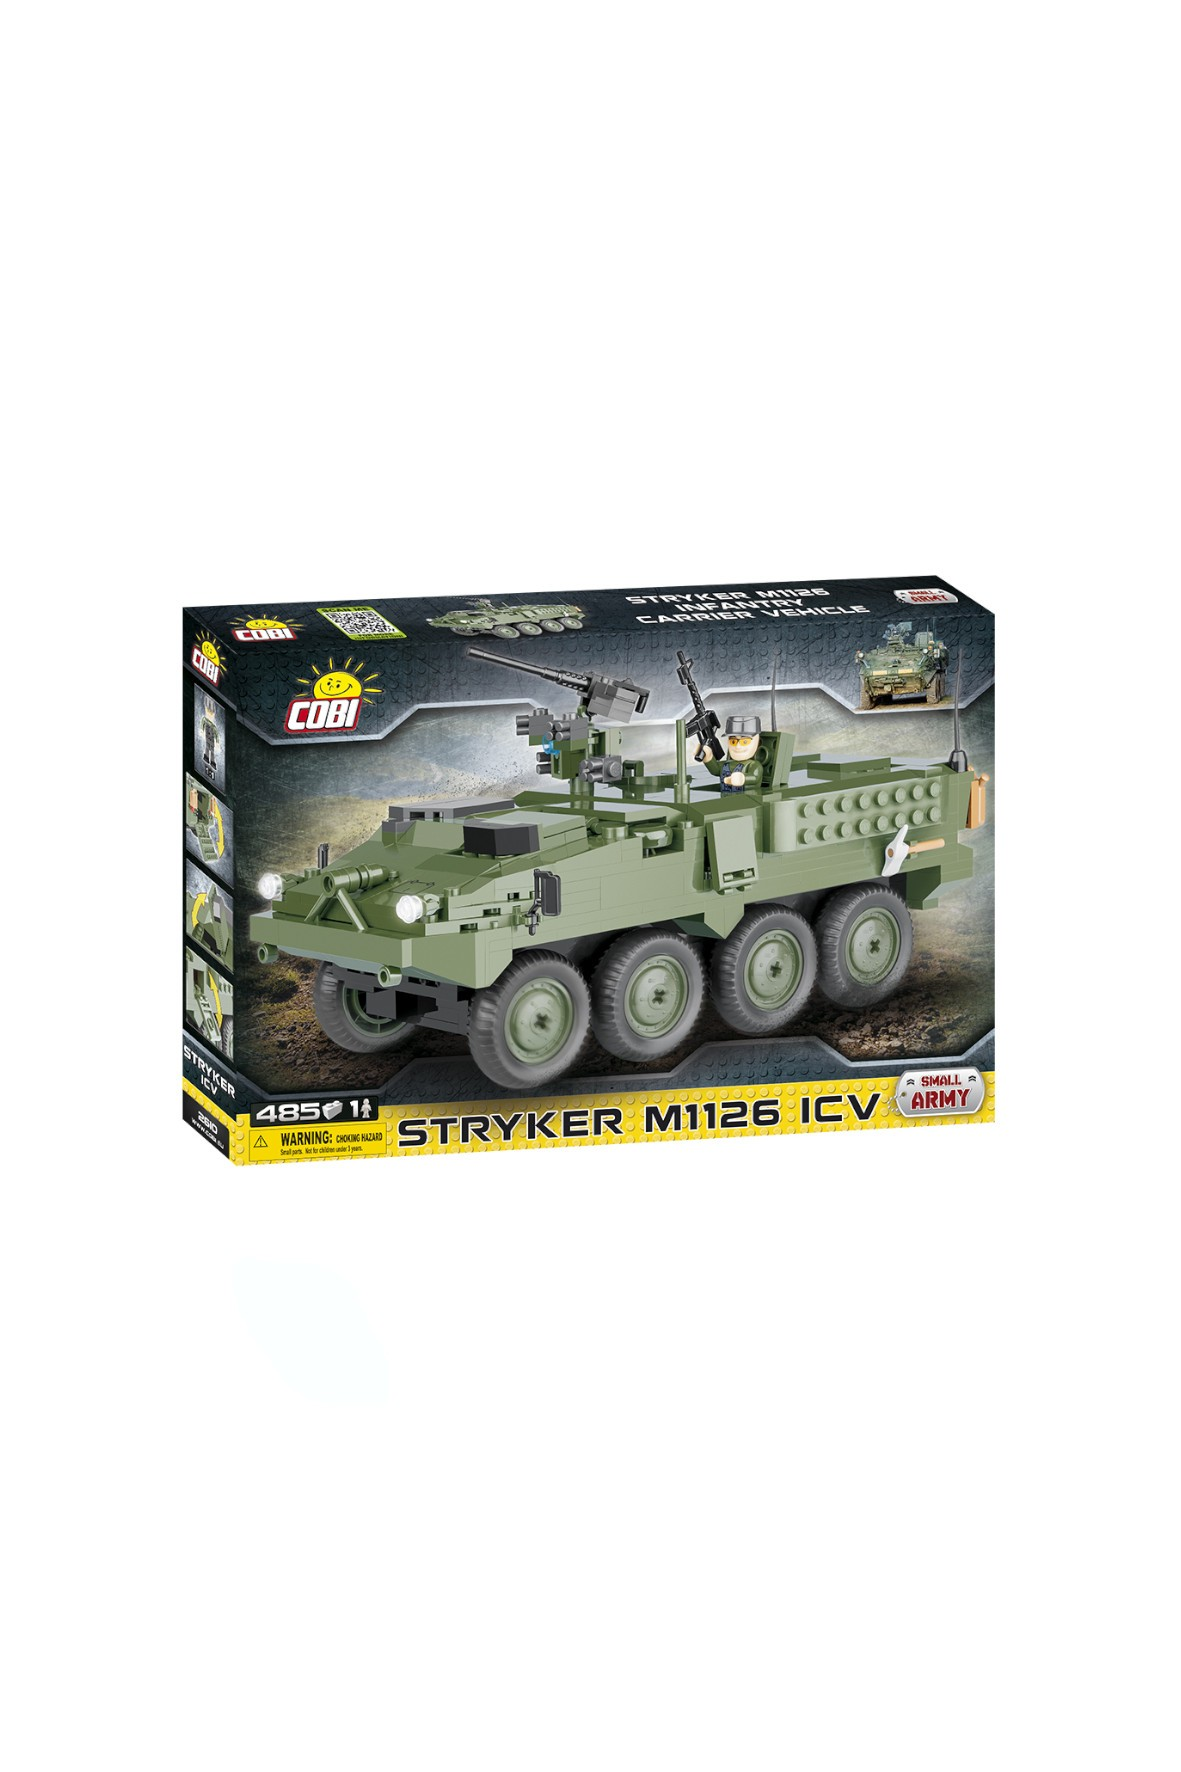 Klocki COBI Small army 2610